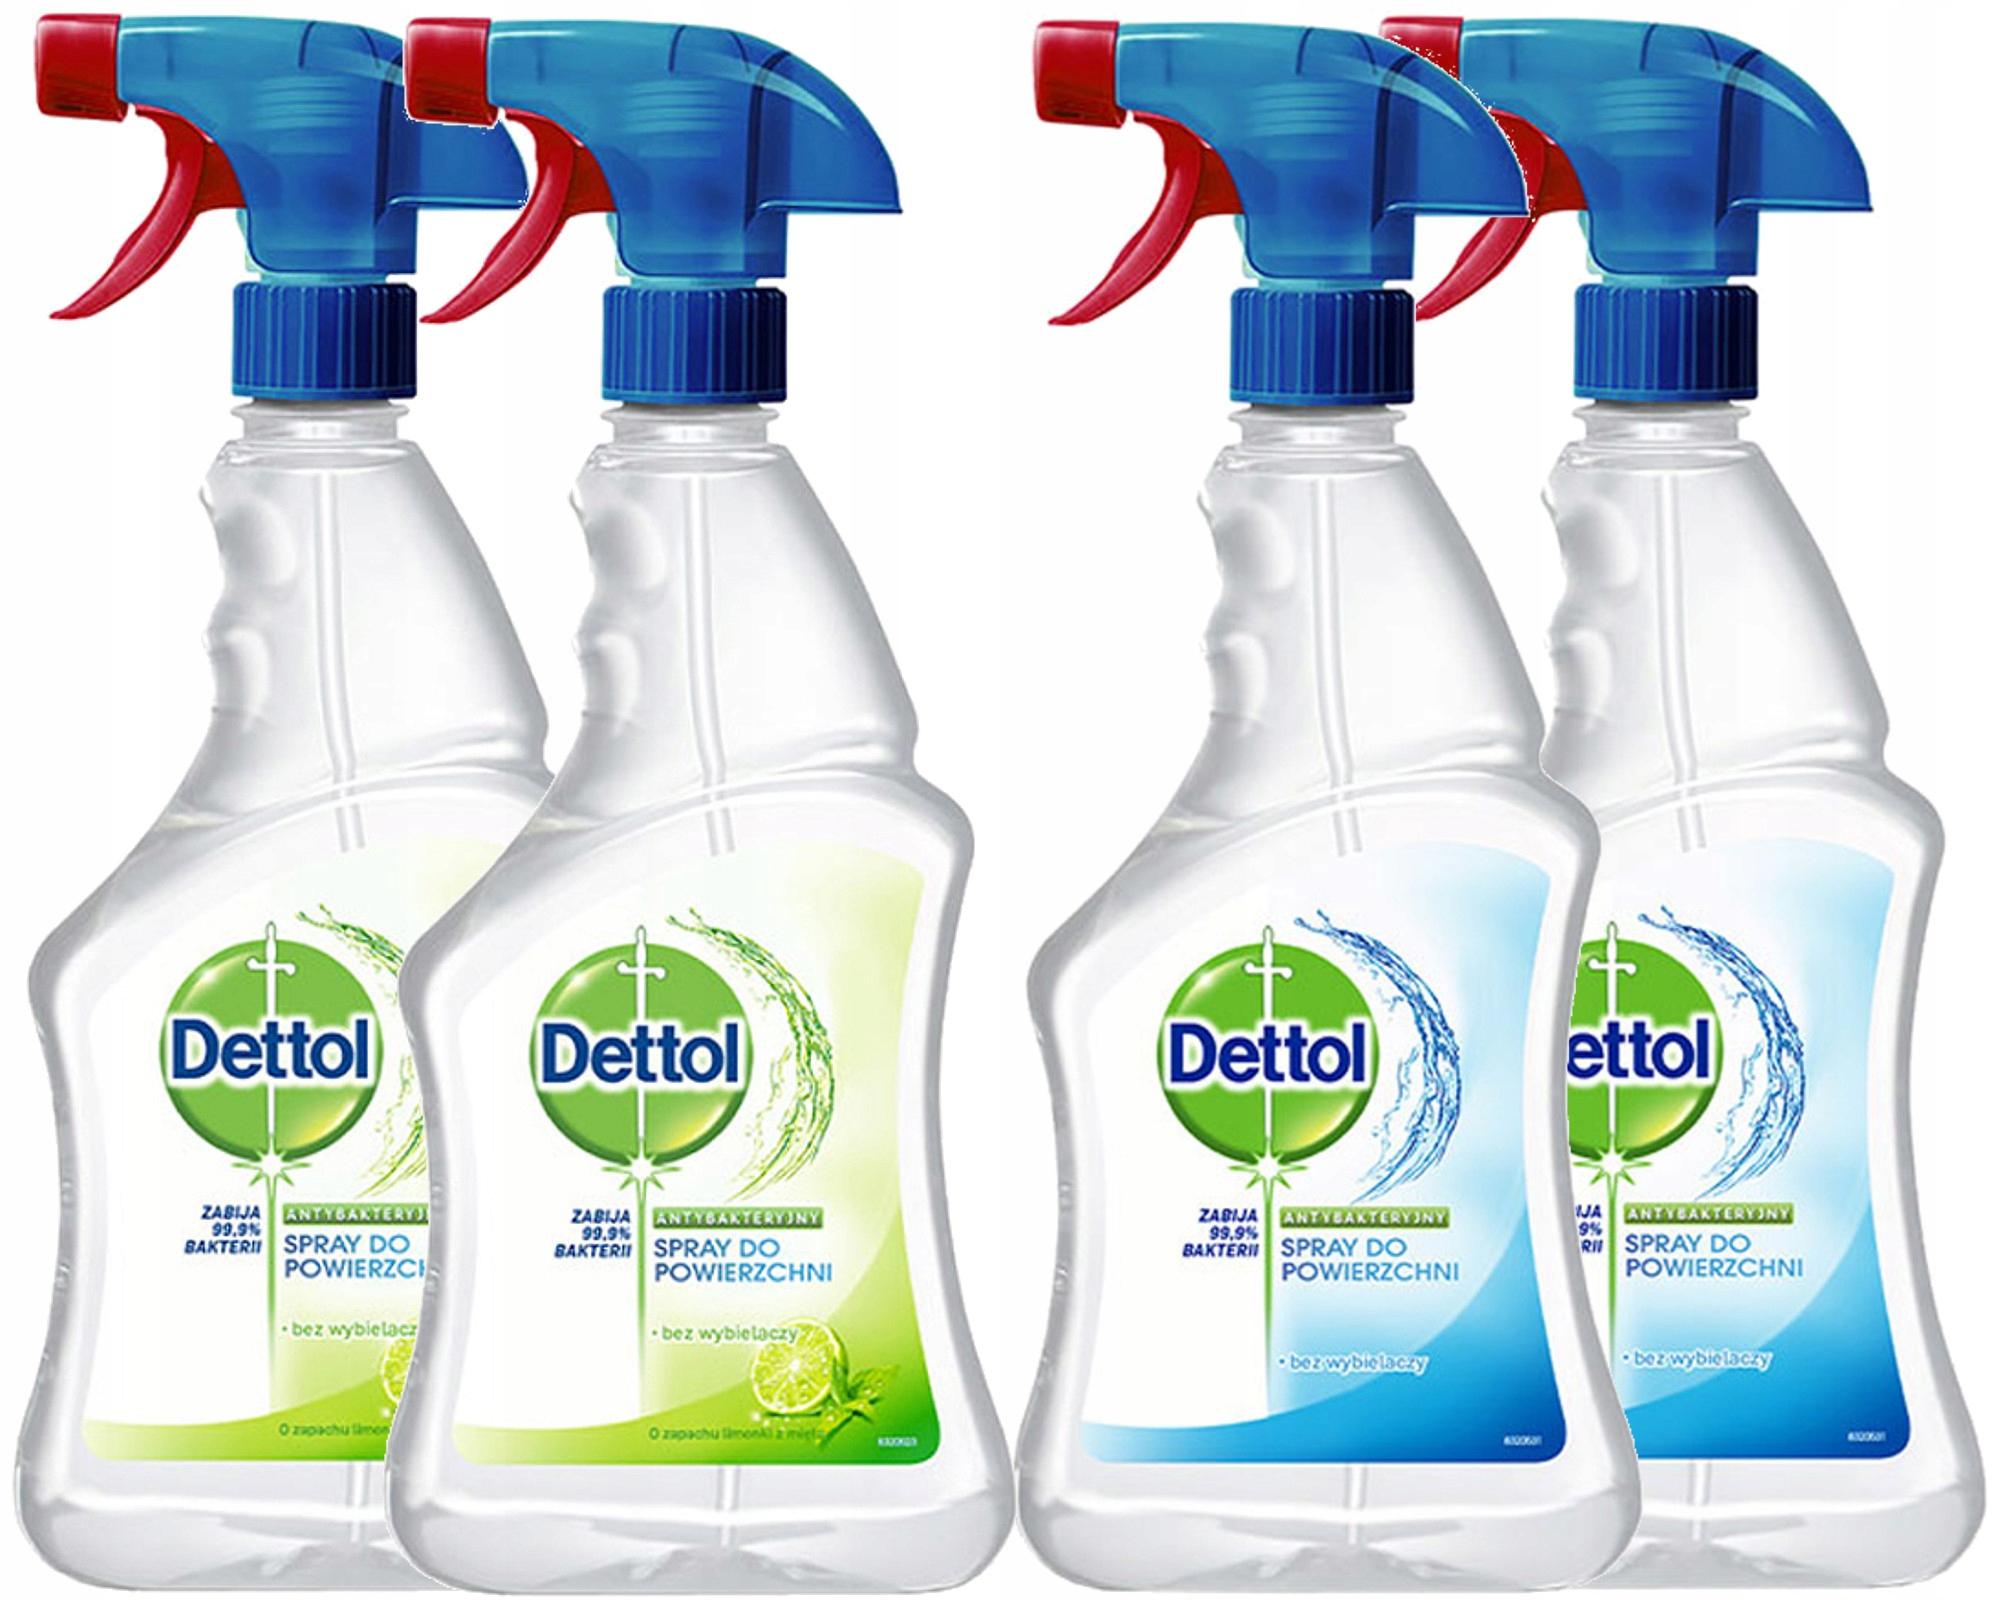 Dettol Antybakteryjny Spray Mix Zestaw 4 x 500ml